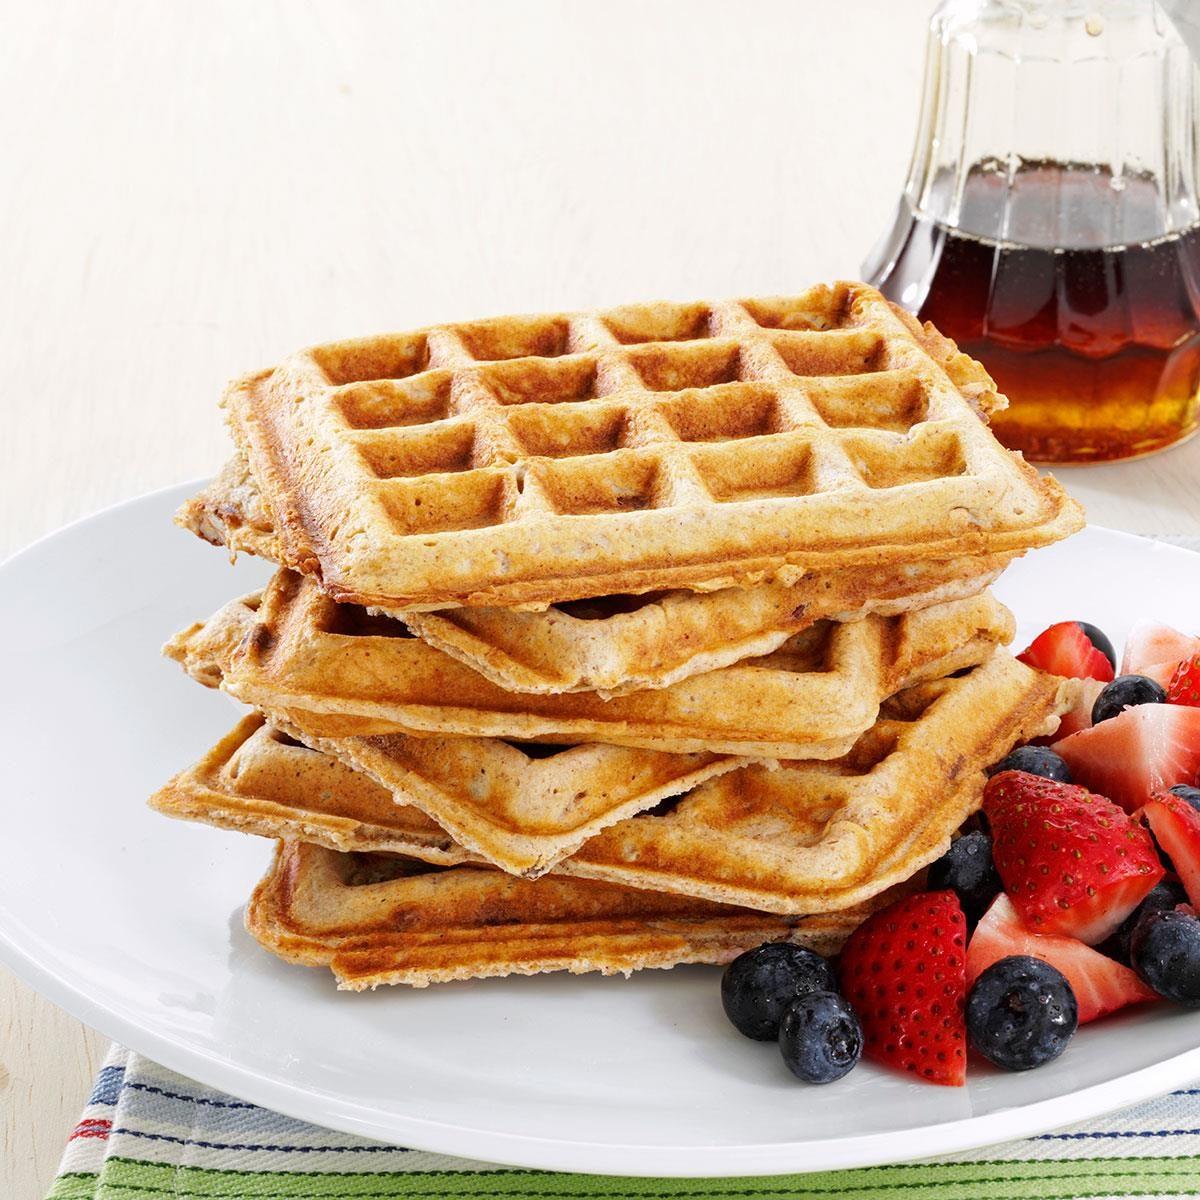 Soul satisfying oatmeal waffles